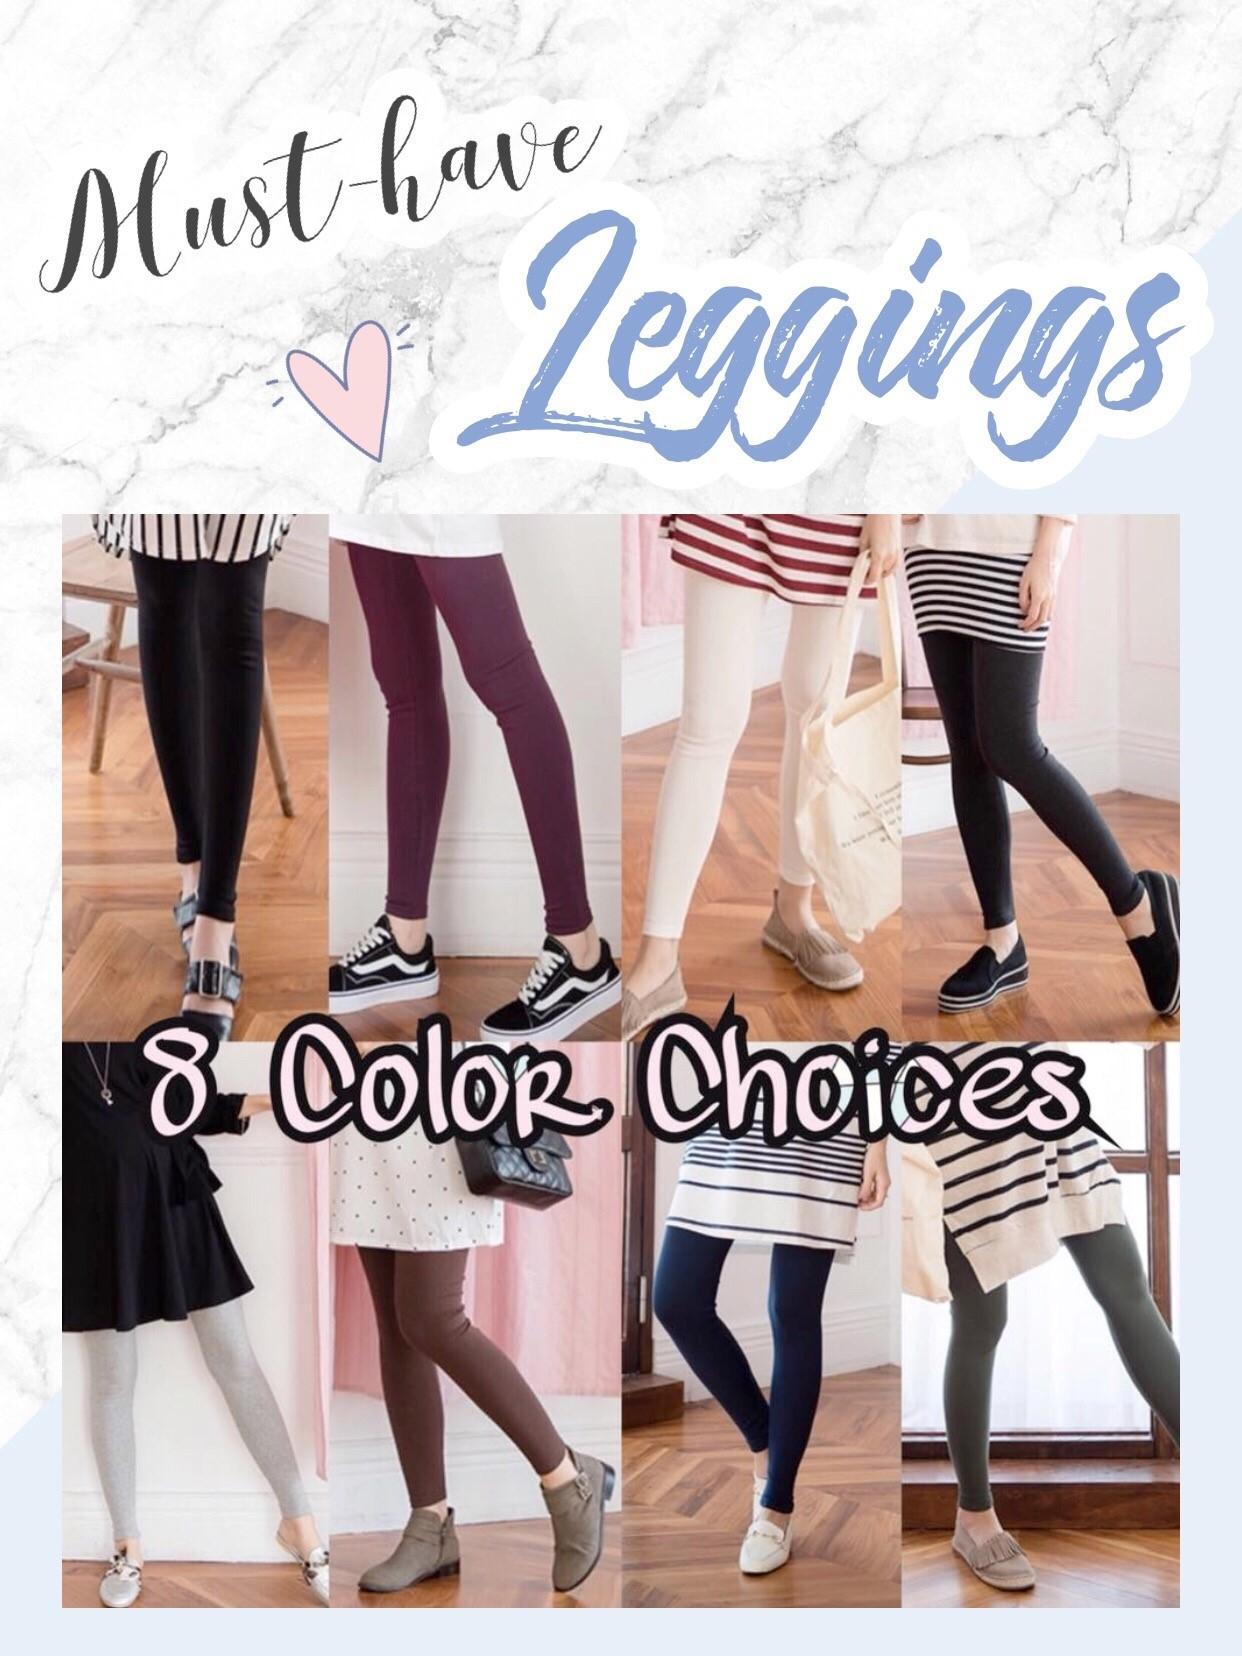 leggings,孕婦褲,孕褲,孕婦LEGGINGS,孕婦內搭褲,孕婦P褲,孕婦托腹褲,可調腰圍,孕婦裙褲,leggings,legging